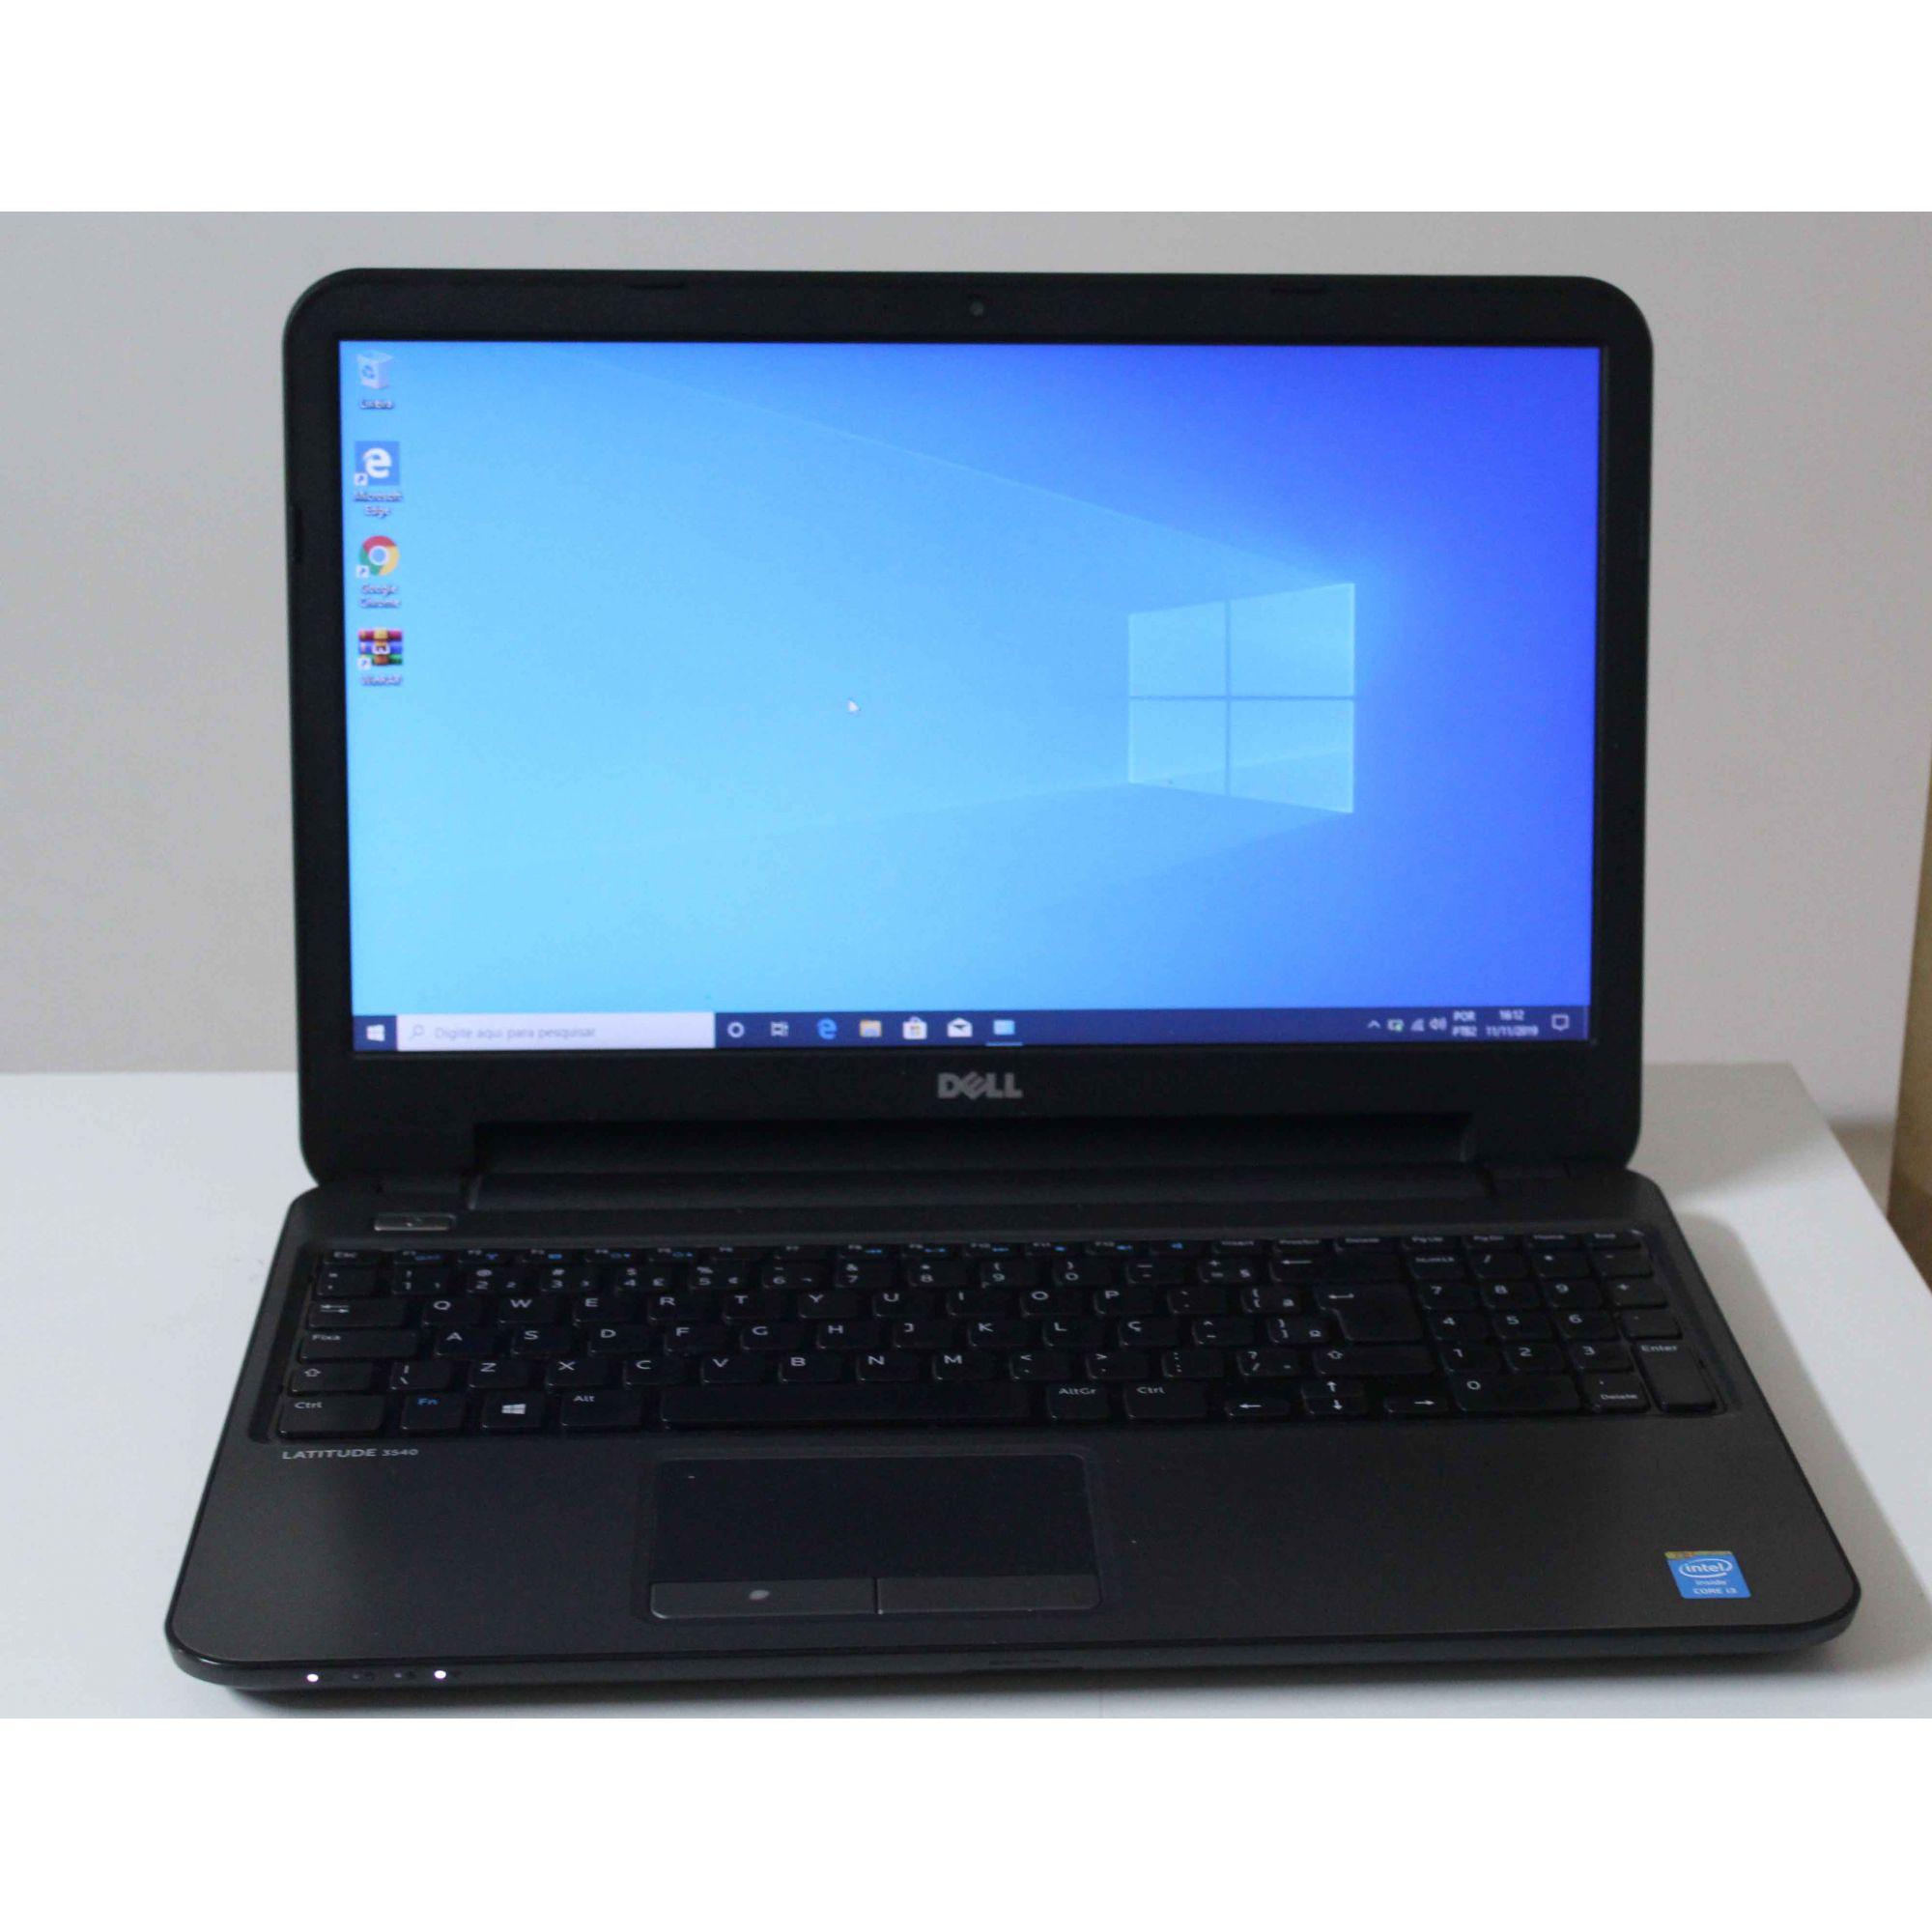 Notebook Dell Latitude 3540 15.6'' Intel Core i3 1.7GHz 8GB HD-500GB + Alphanumérico